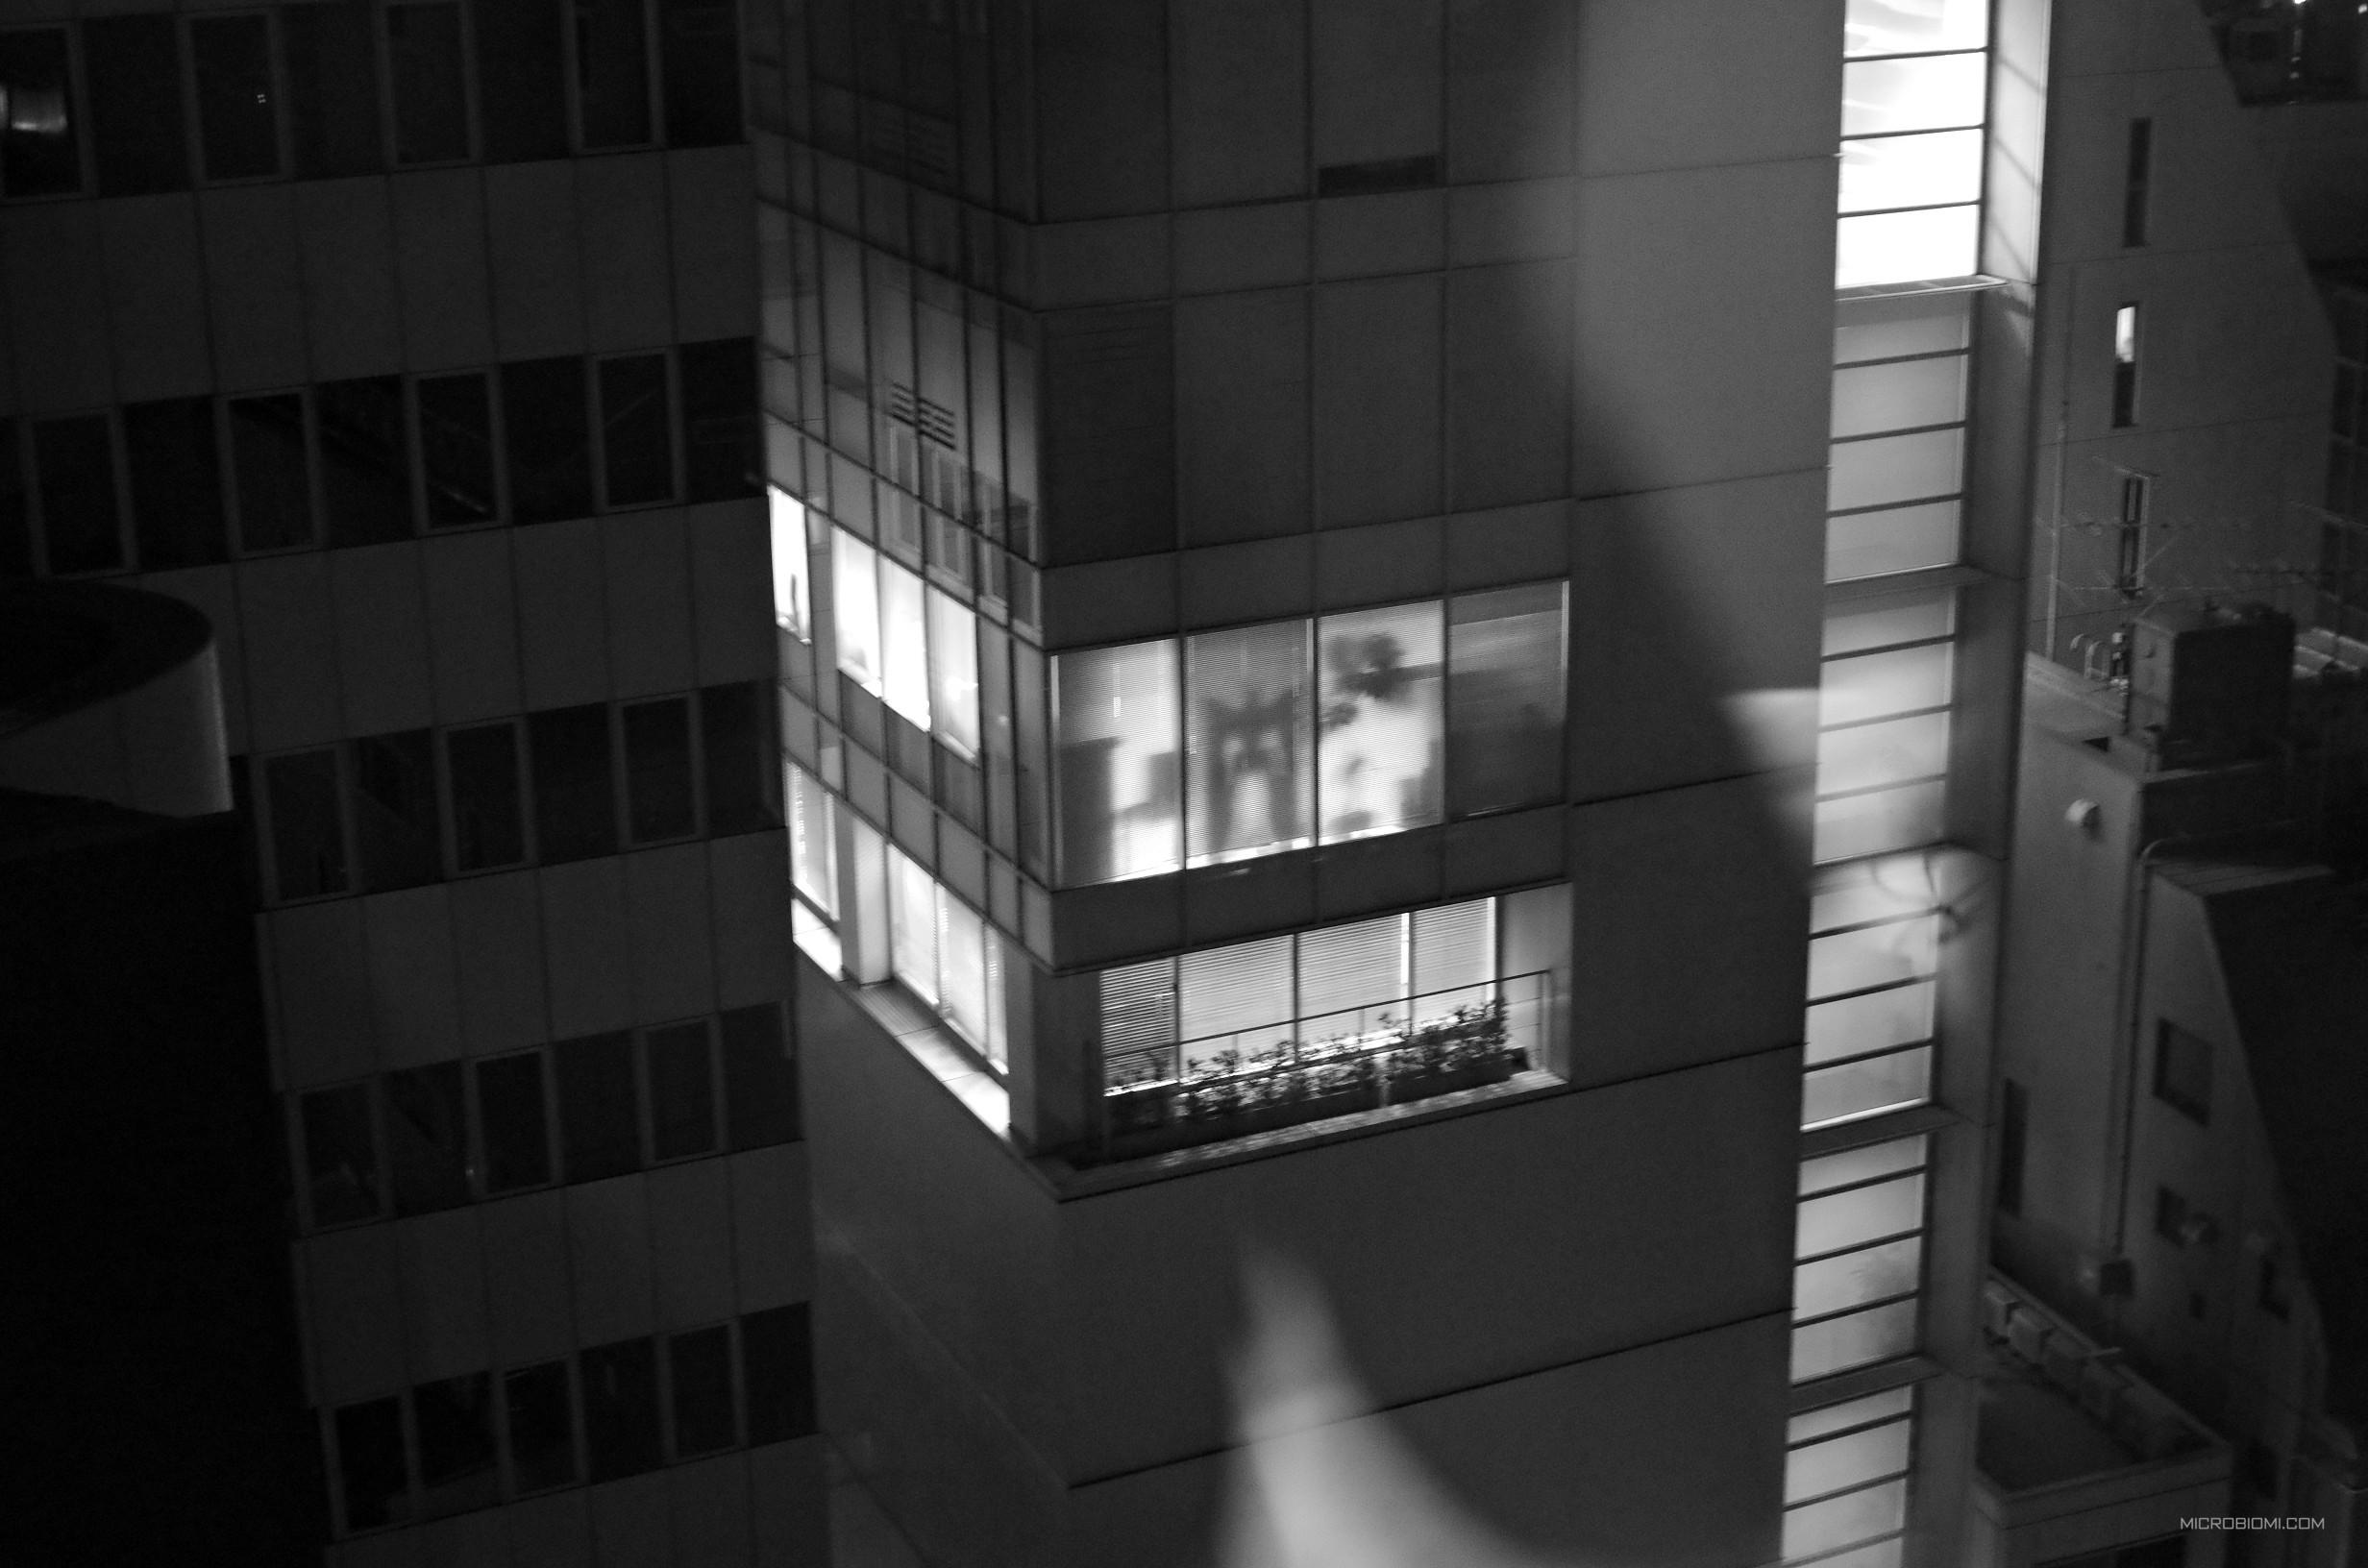 La nostra camera all'Hotel Monterey, Tokyo -  Akasaka, dava sul palazzo della Tohokushinsha Film Corporation (Patlabor)